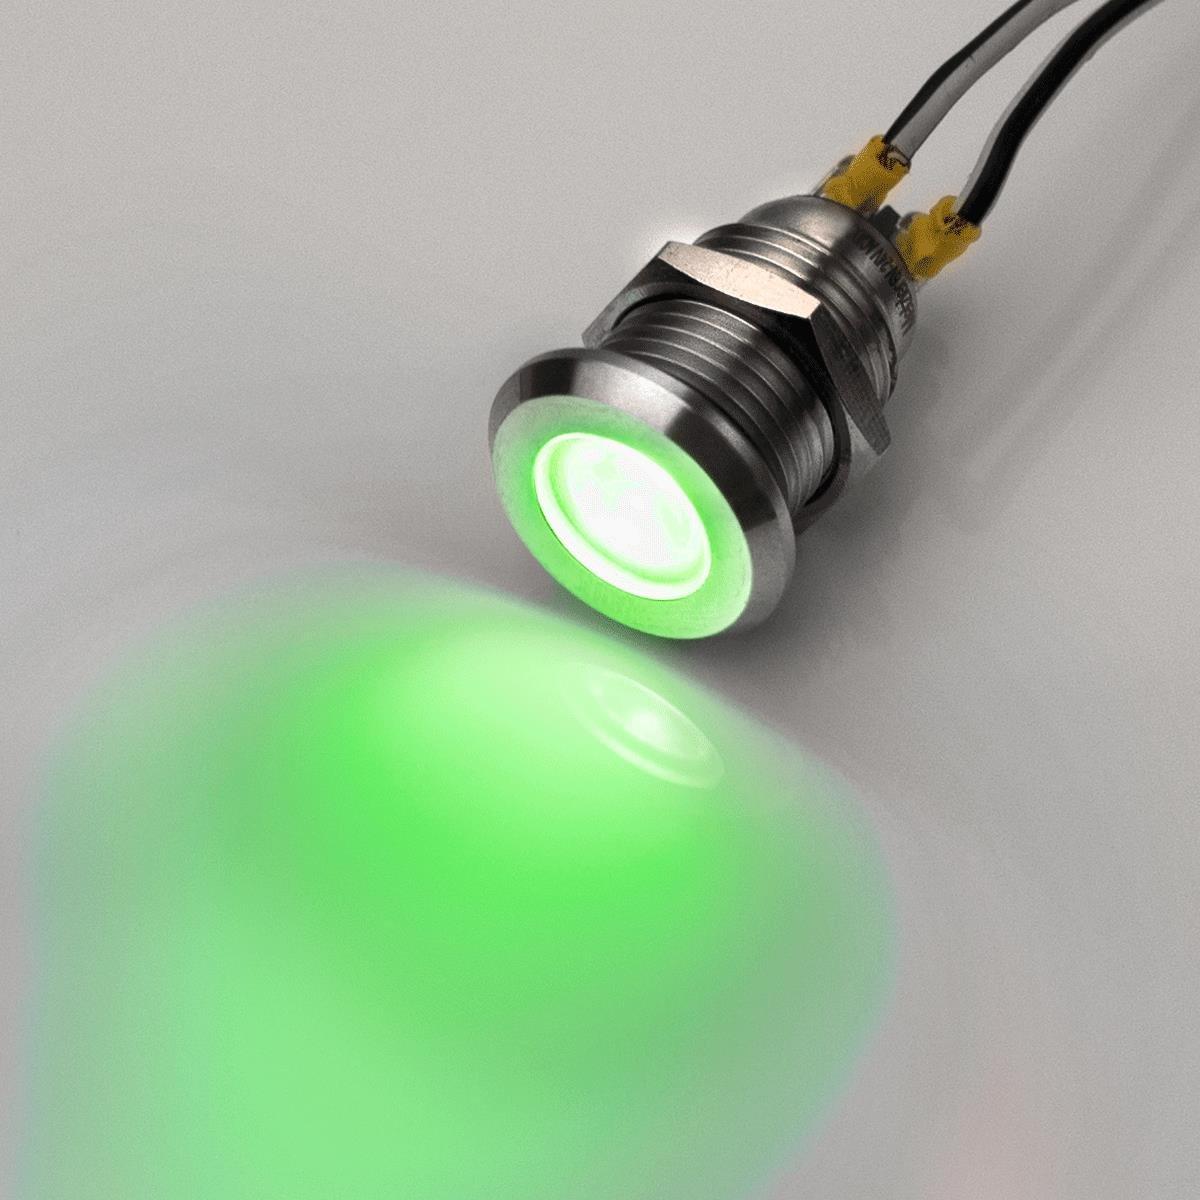 En acier inoxydable Lampe de contr/ôle LED Metzler-Trade CA//CC 6,/V/- 24/V rouge /Étanche IP67/- Filetage M12 Bleu vert blanc blanc jaune V2A